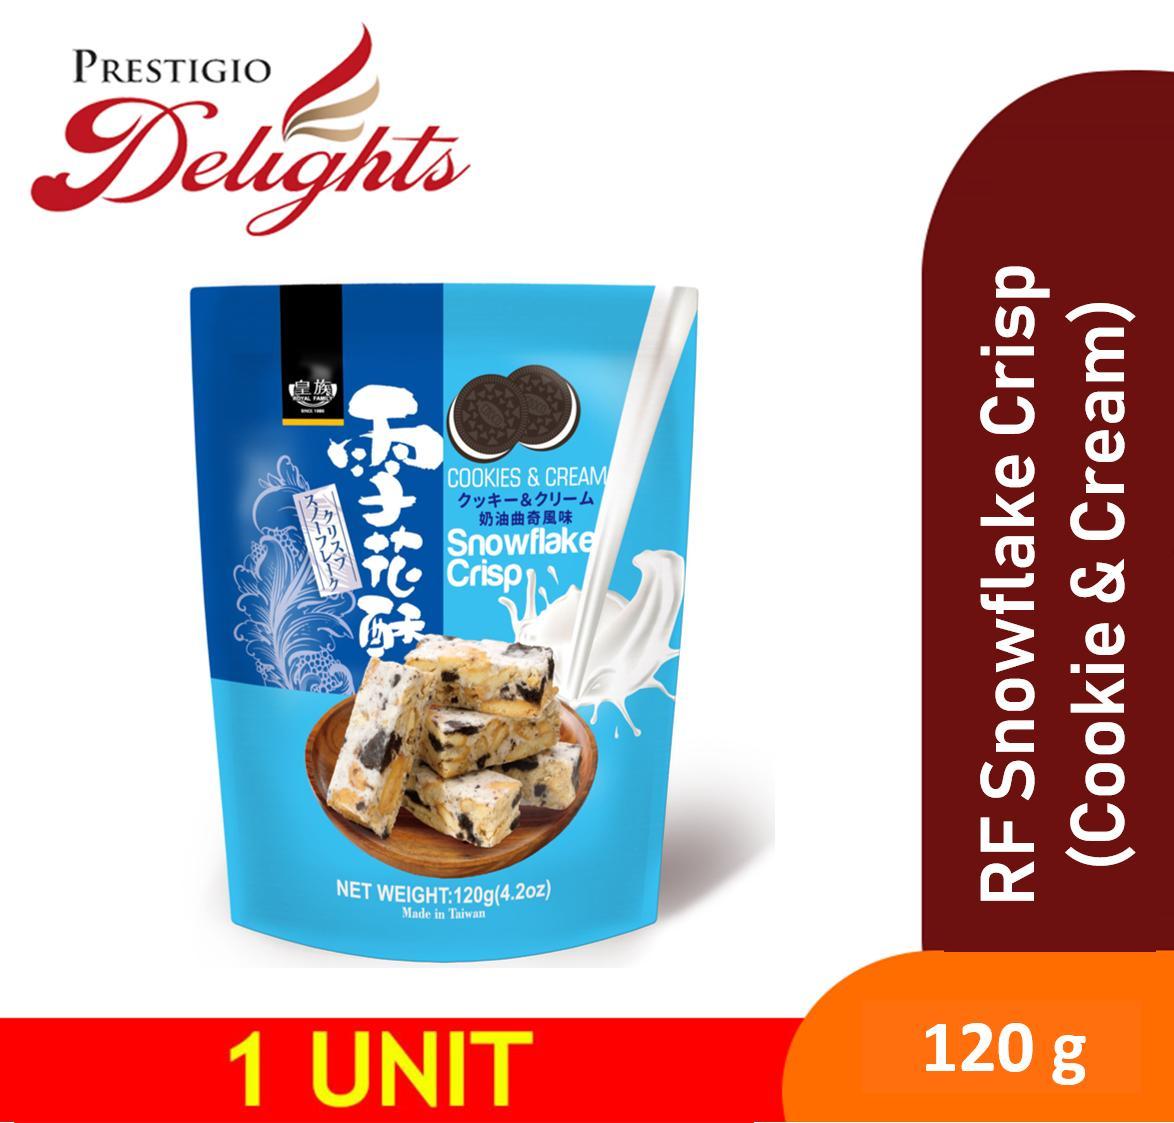 Royal Family Snowflake Crisp (cookie & Cream) 120g 雪花酥-奶油曲奇 By Prestigio Delights.